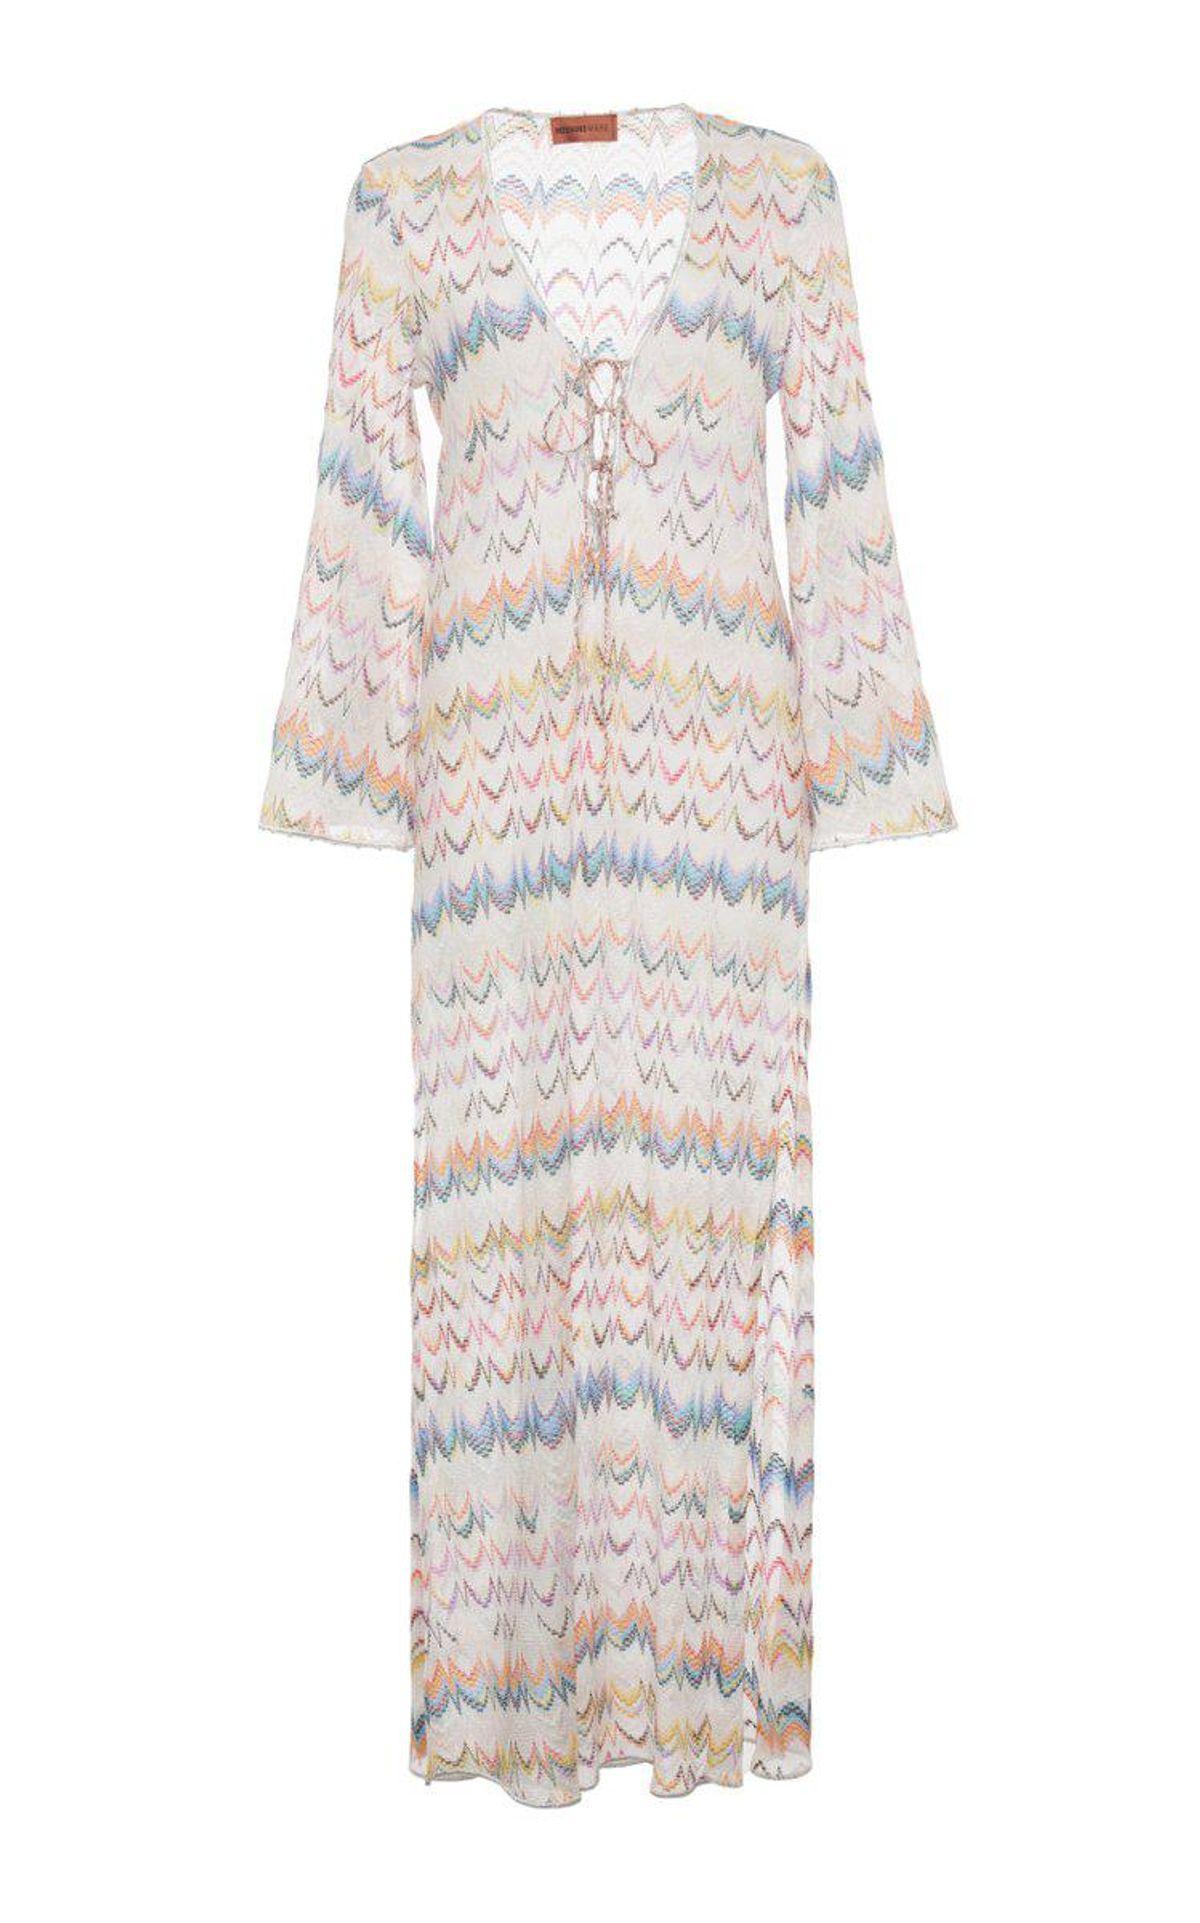 Crochet-Knit Cover Up Maxi Dress